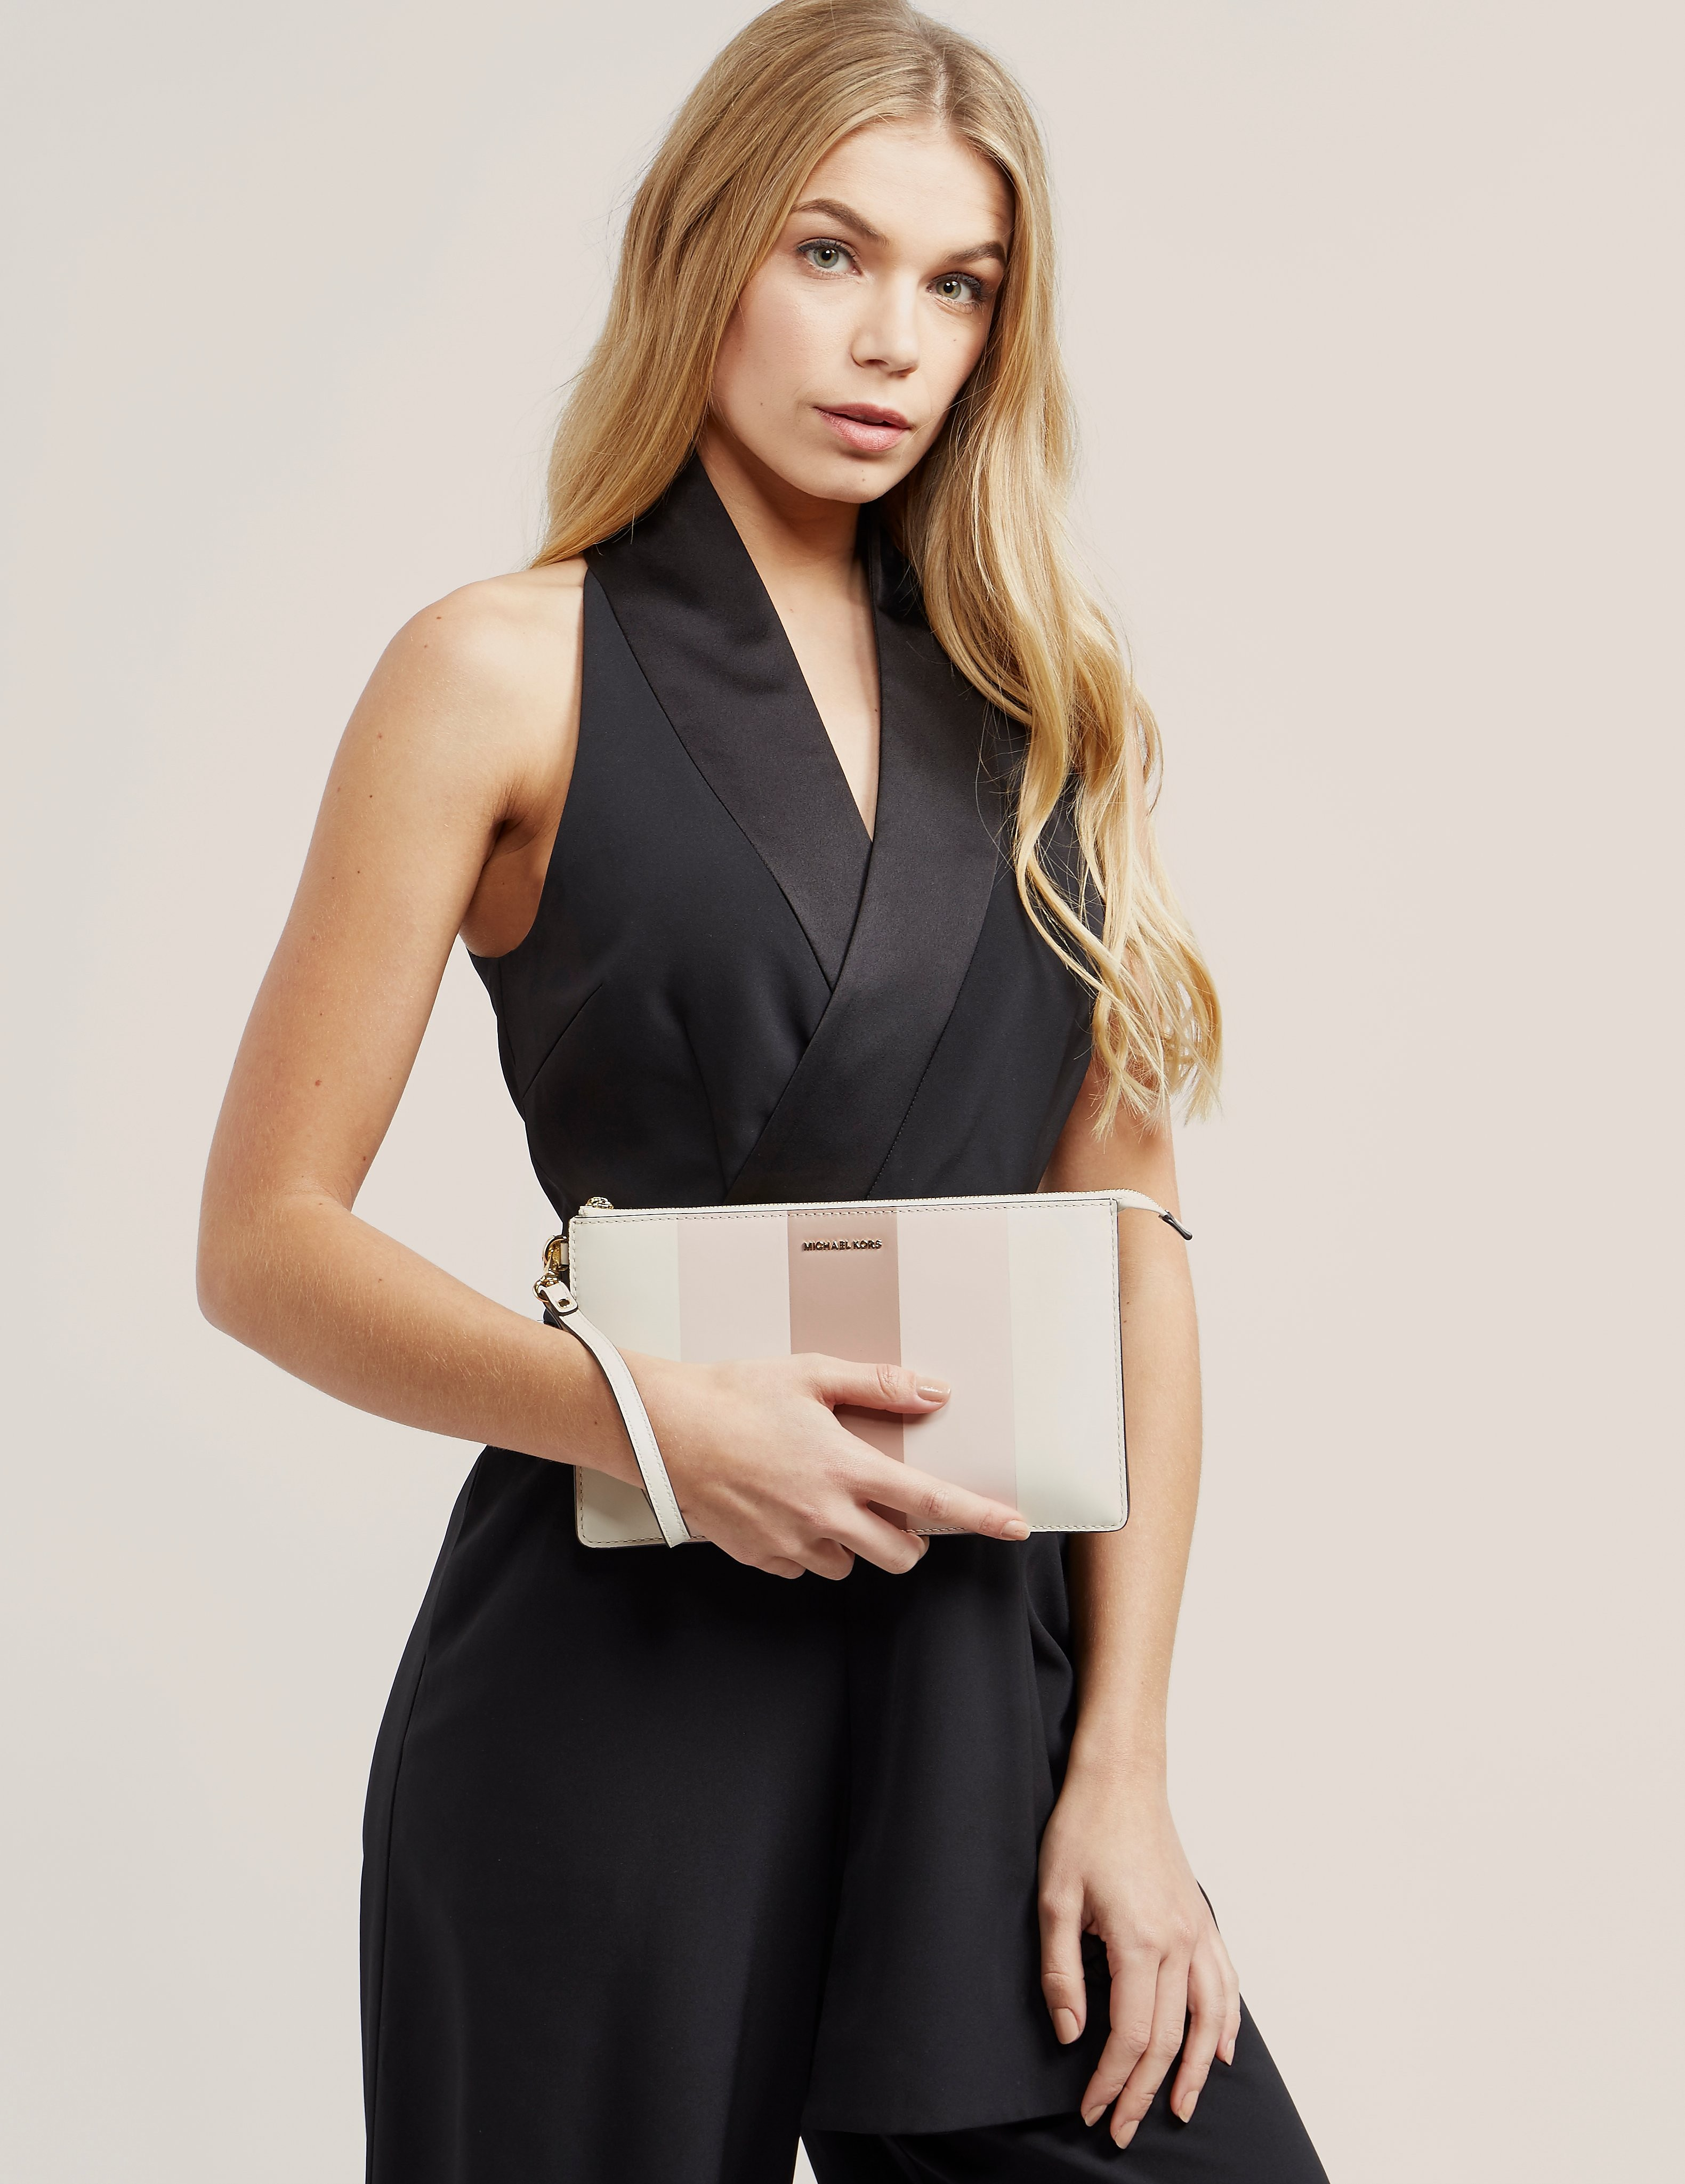 Michael Kors Daniela Multi Stripe Large Wristlet